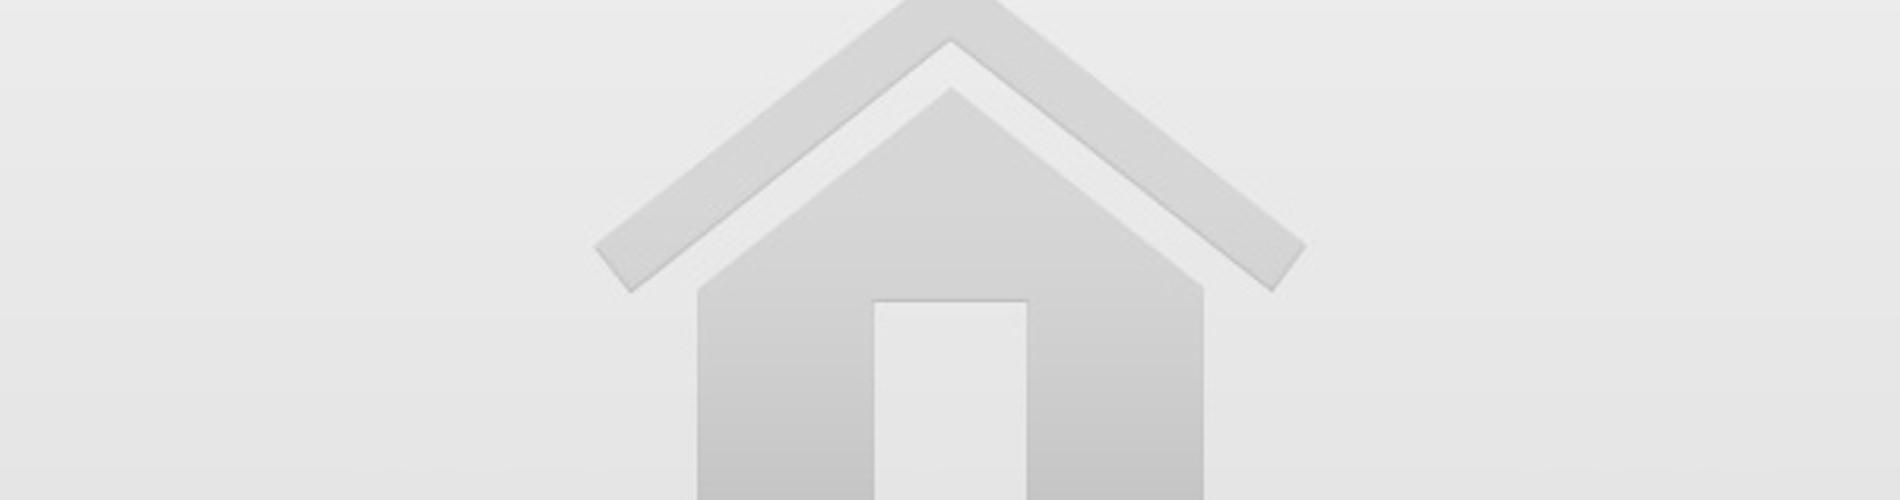 Vacation Rental Villa 74 by soltroiavillas